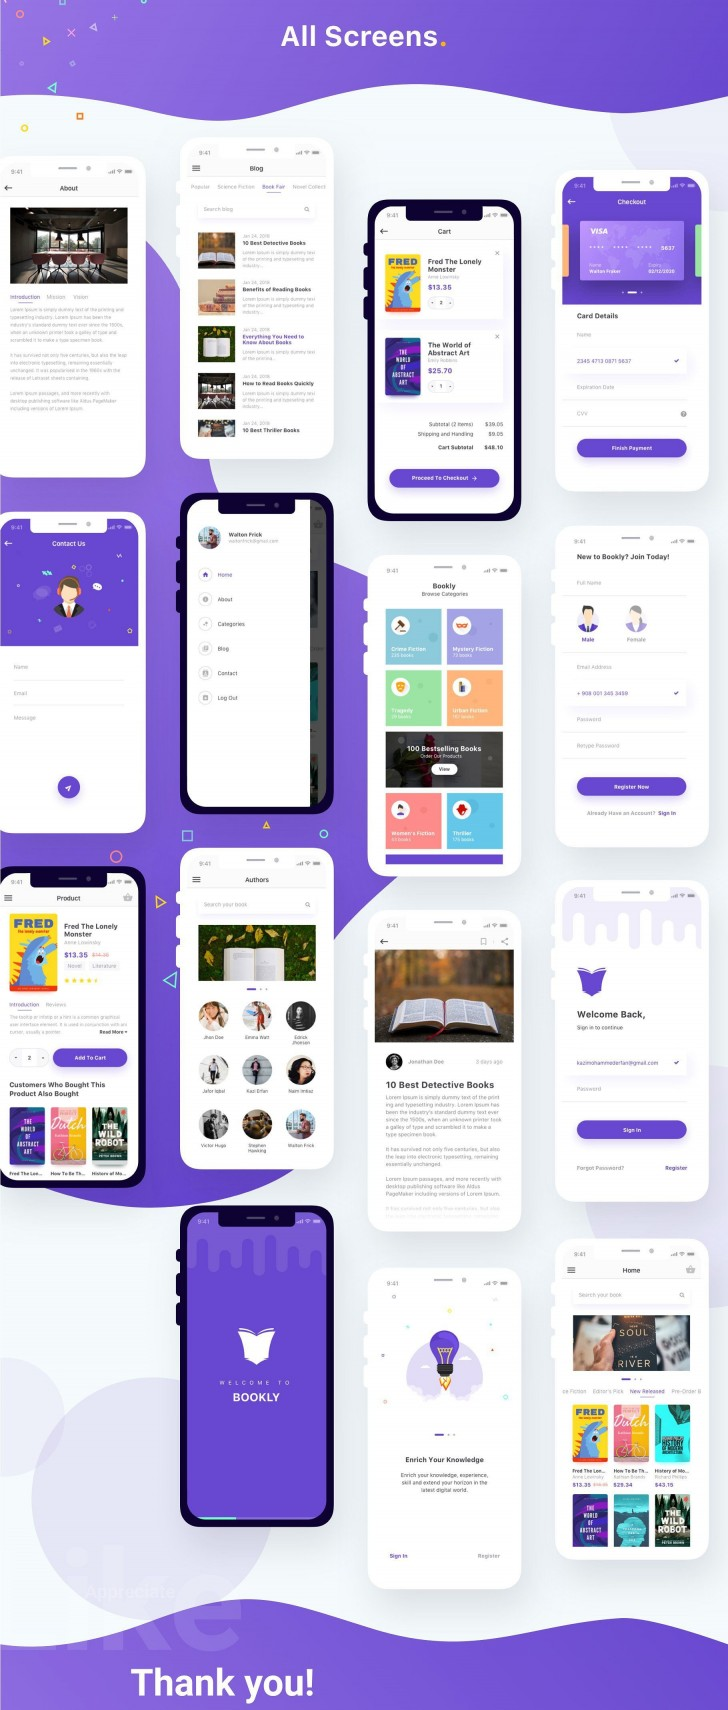 001 Fantastic Iphone App Design Template High Def  X Io Sketch728